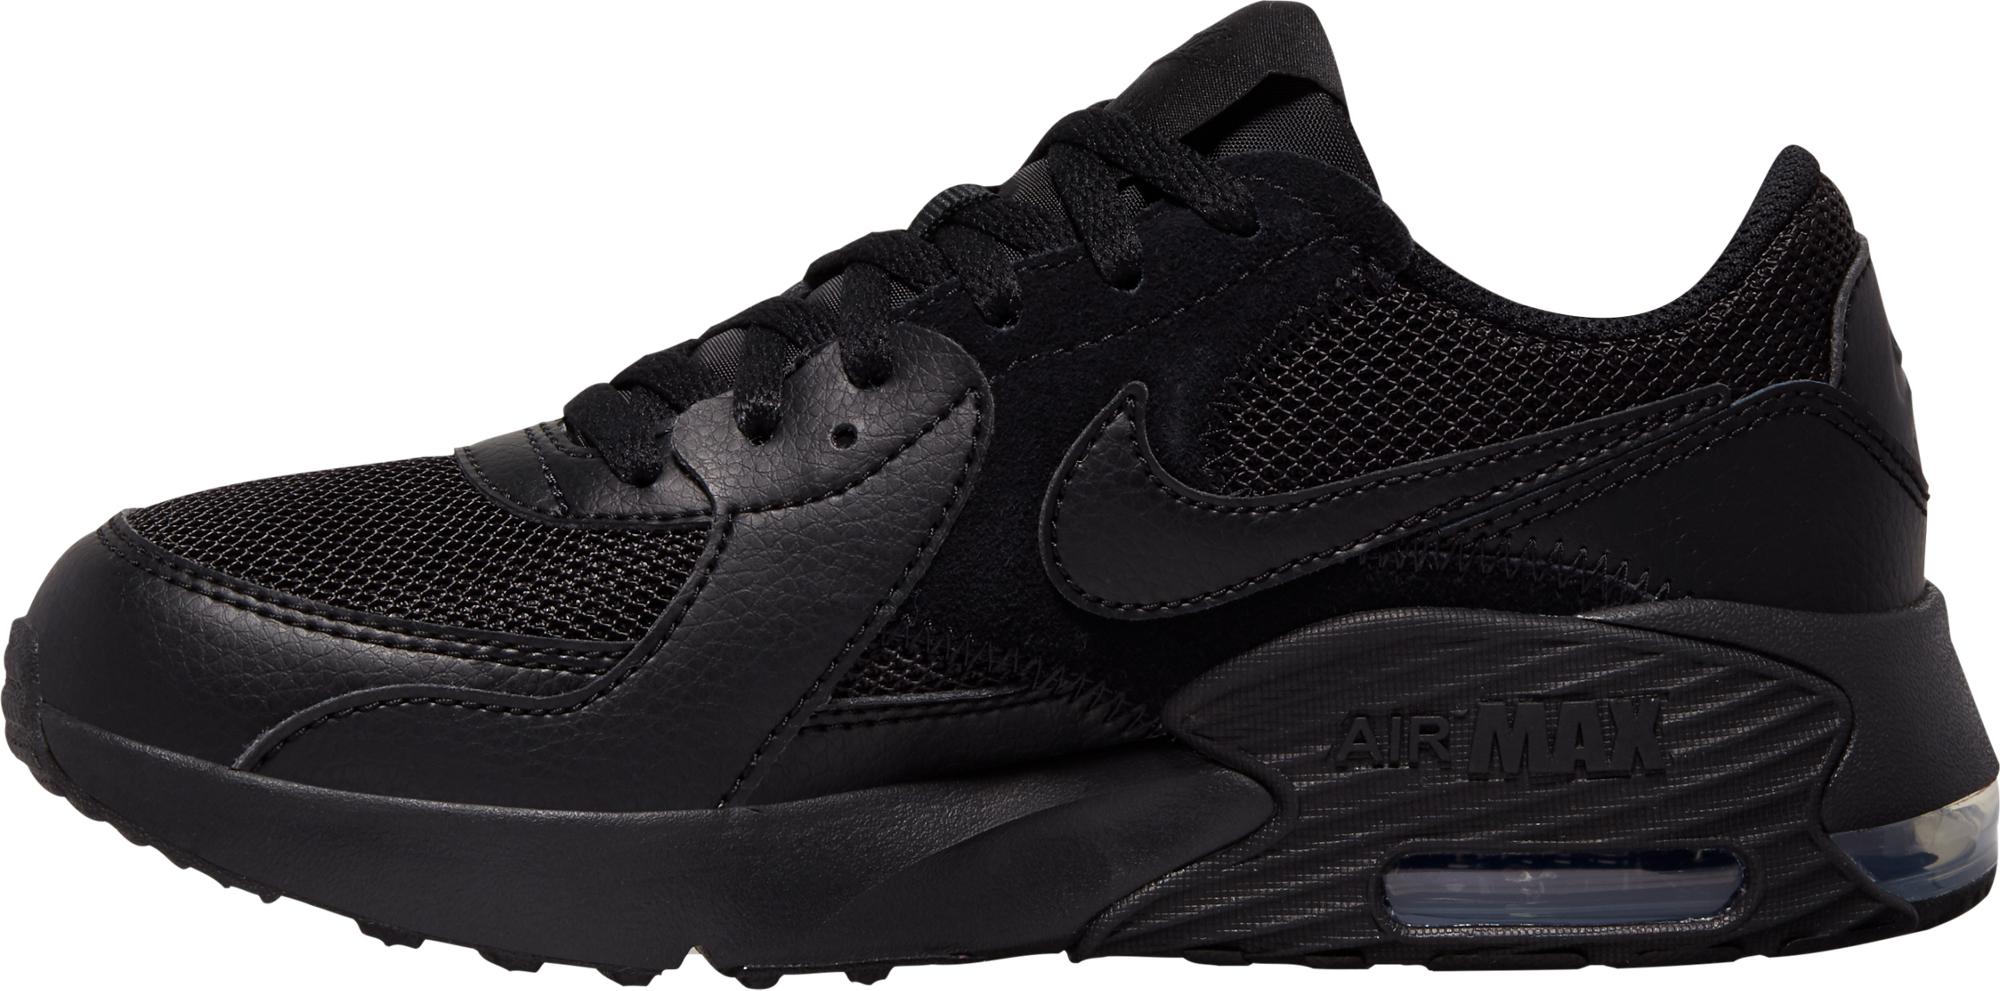 Nike Кроссовки для мальчиков Nike Air Max Excee (Gs), размер 35 кроссовки nike cortez basic ltr se gs shoe girls aa3043 001